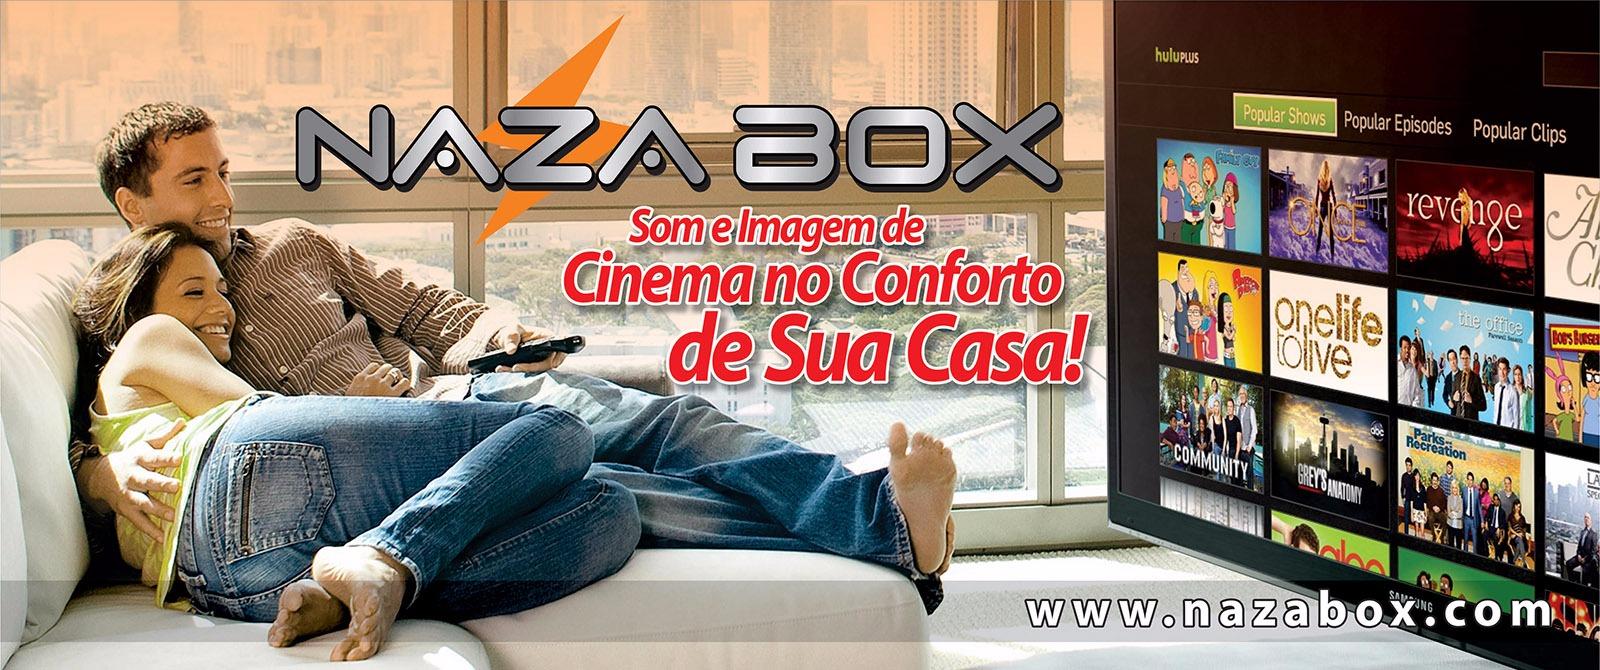 NAZABOX